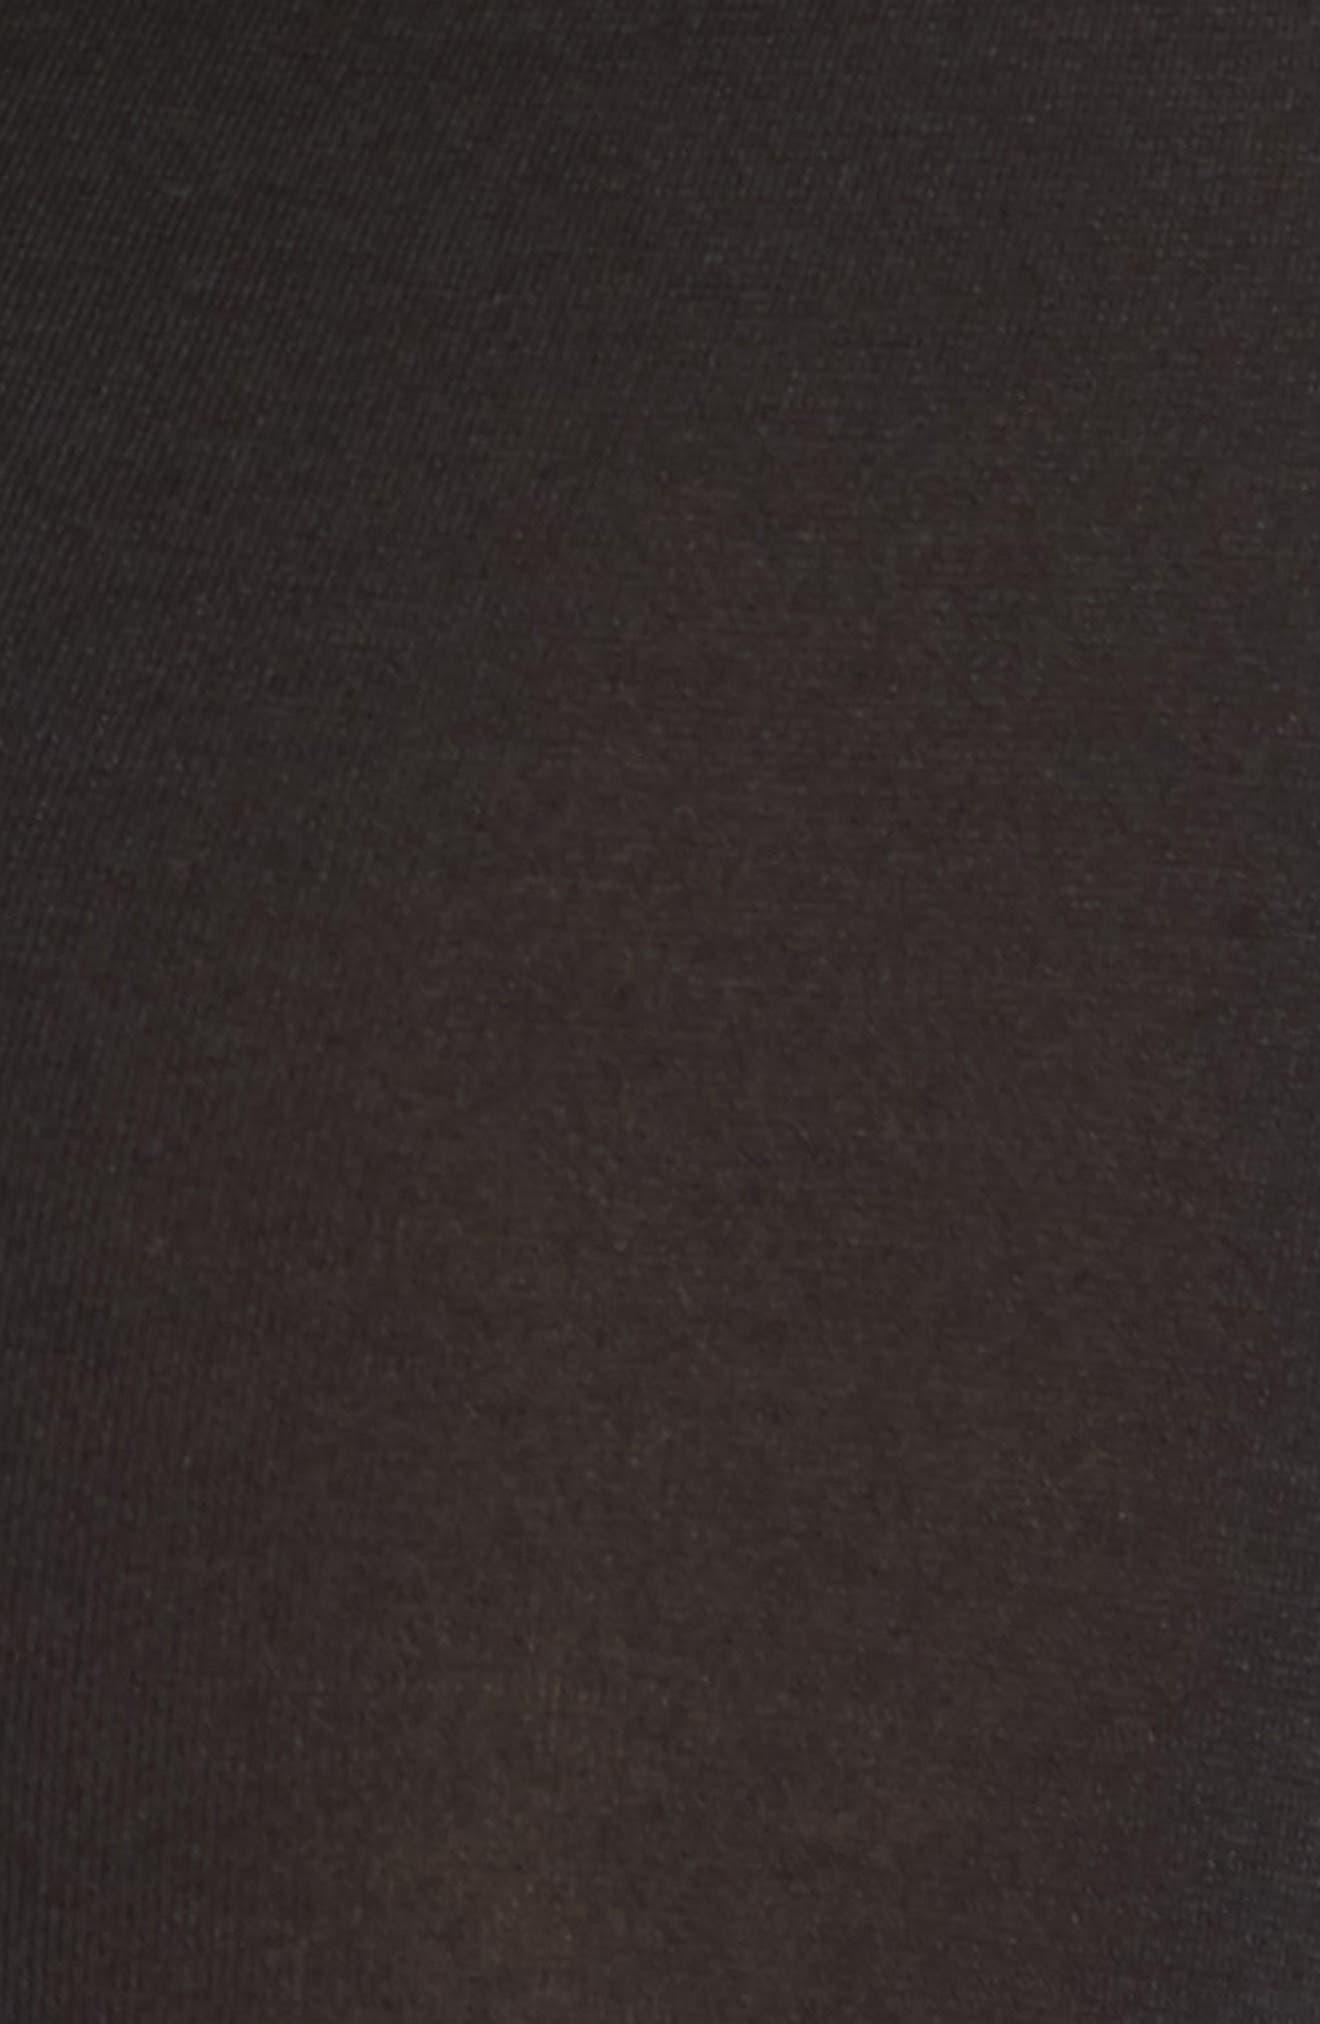 Tommy  John Sleek Heat Leggings,                             Alternate thumbnail 5, color,                             BLACK